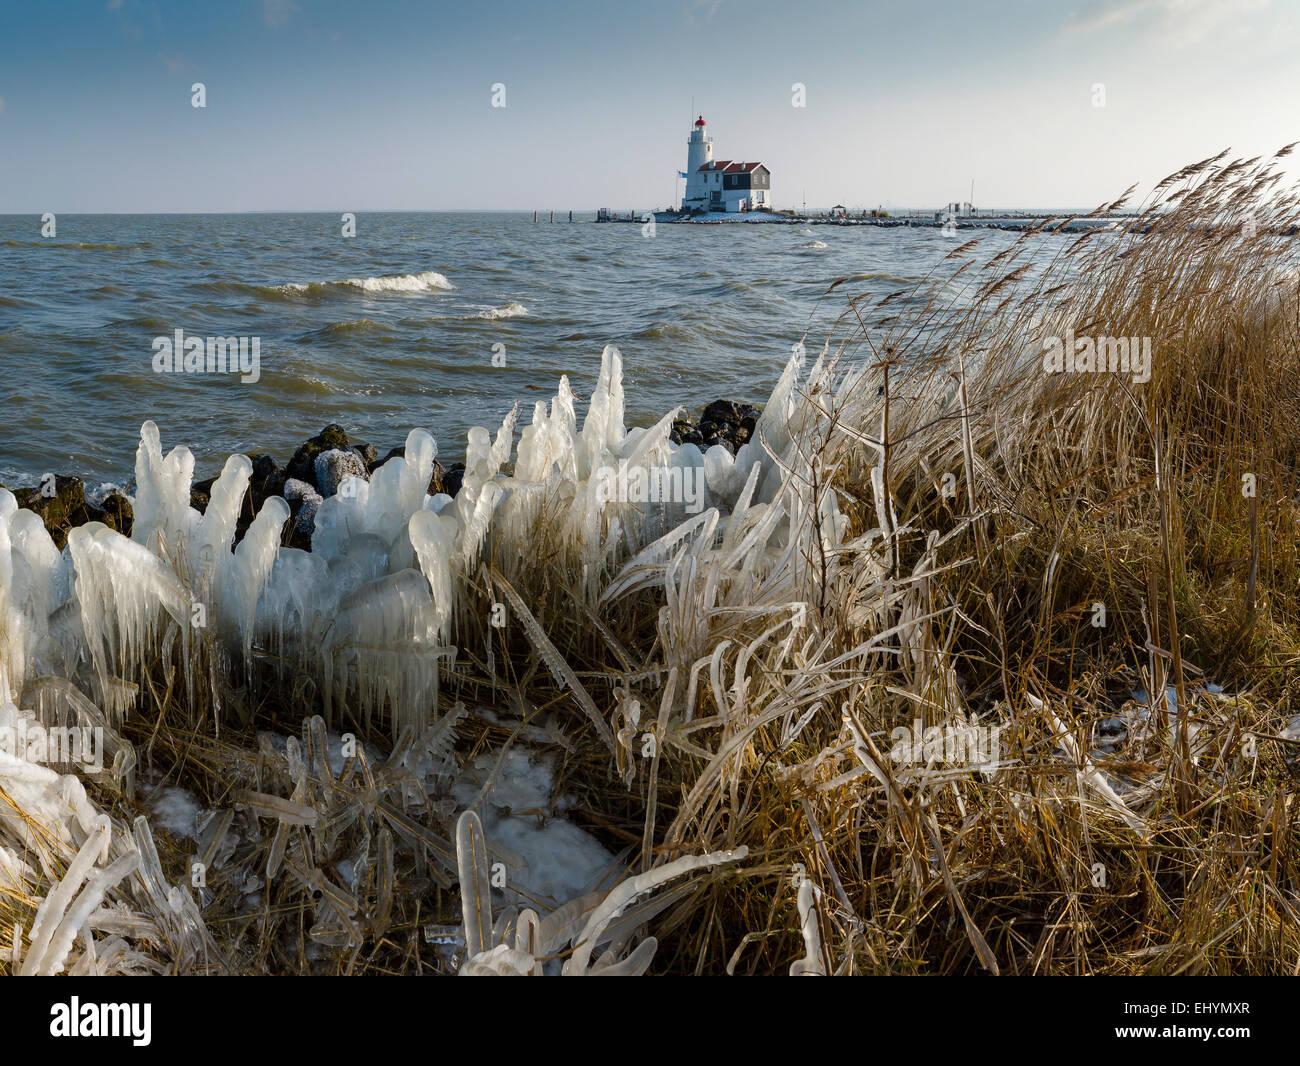 Netherlands, Holland, Europe, Marken, Lighthouse, Het Paard van Marken, landscape, water, winter, snow, ice, - Stock Image